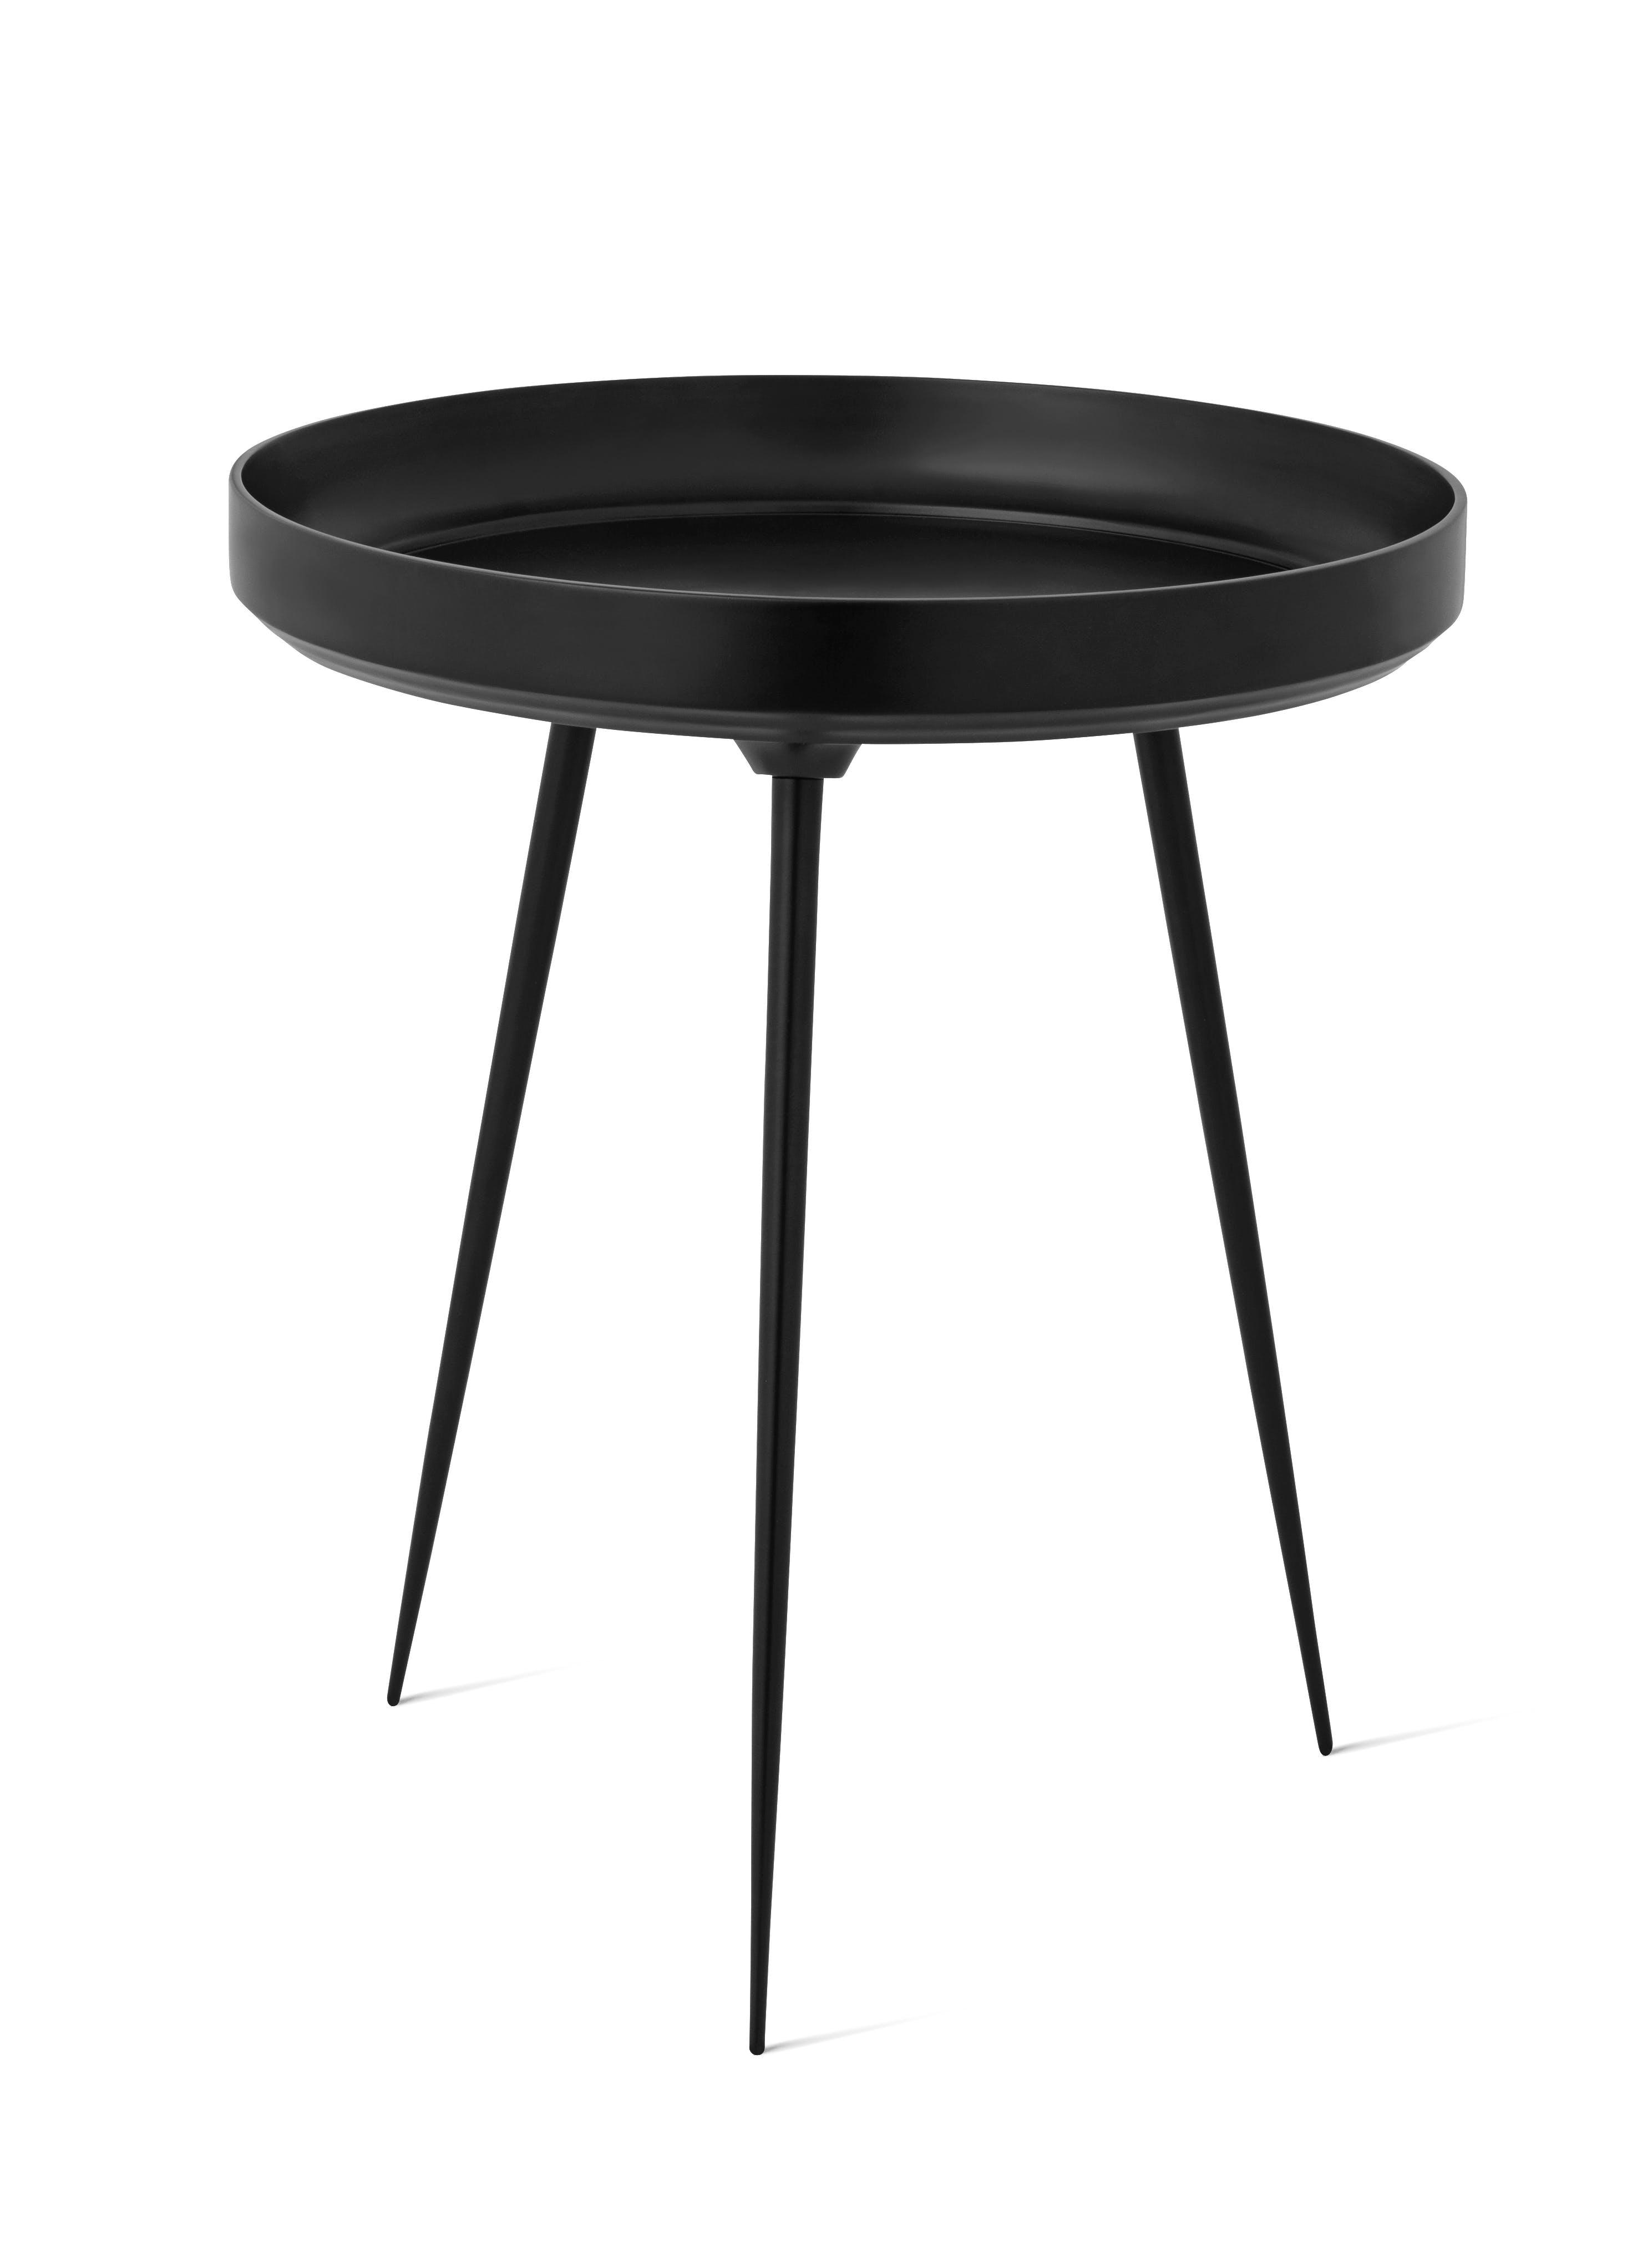 Mater Black Aluminum Bowl Table Haute Living